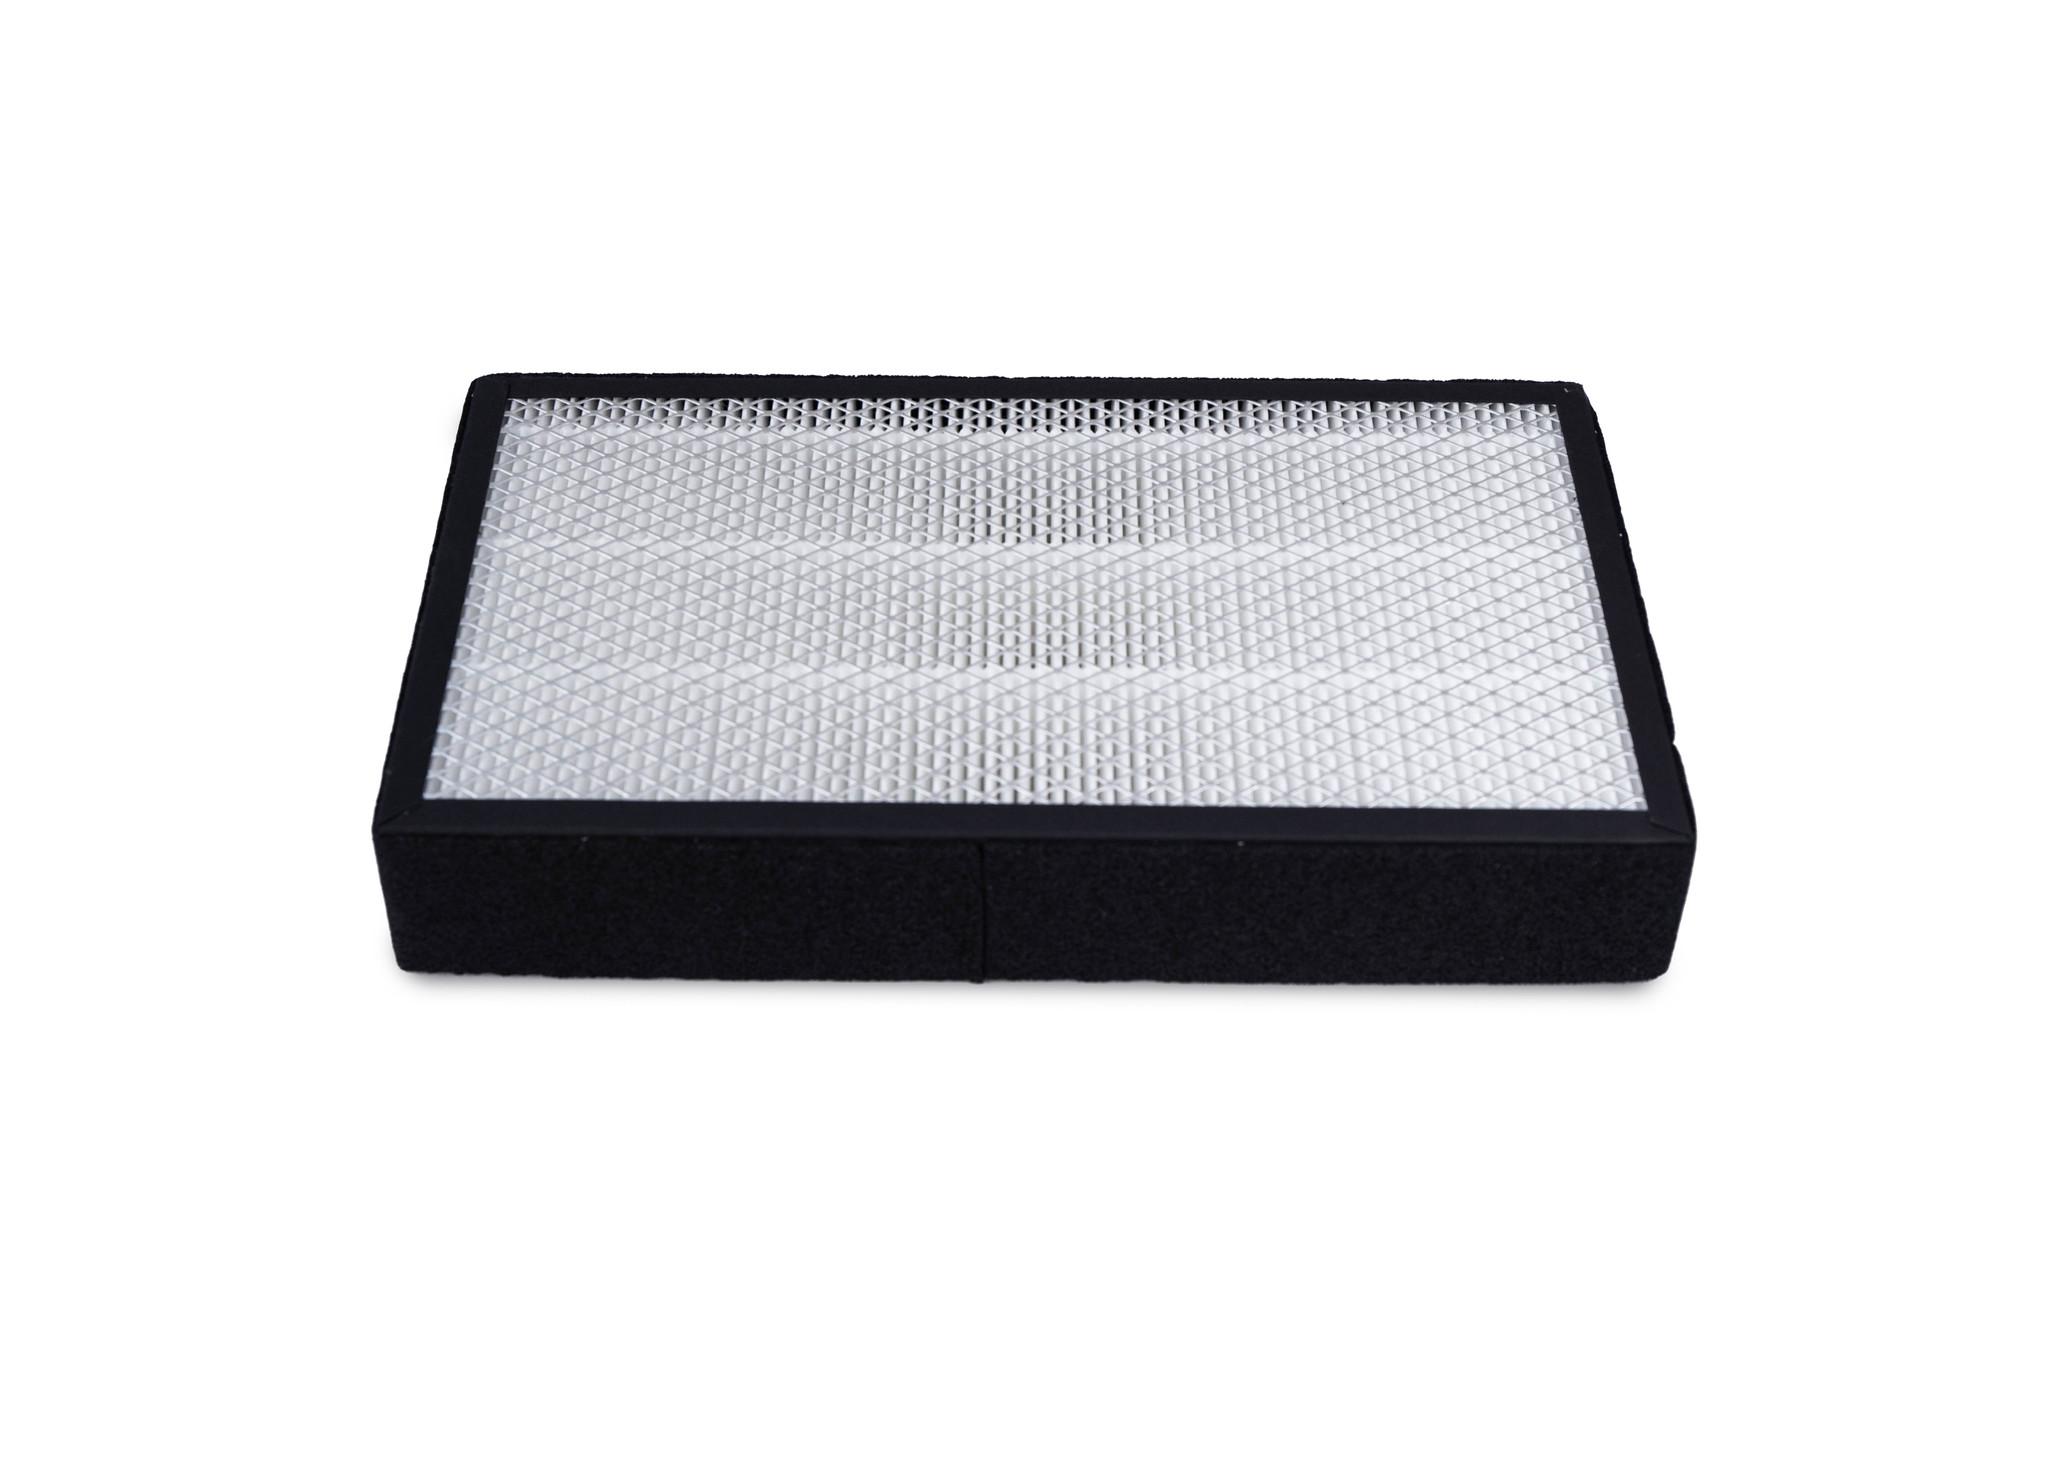 Medium efficiency filter replacement Beam Air